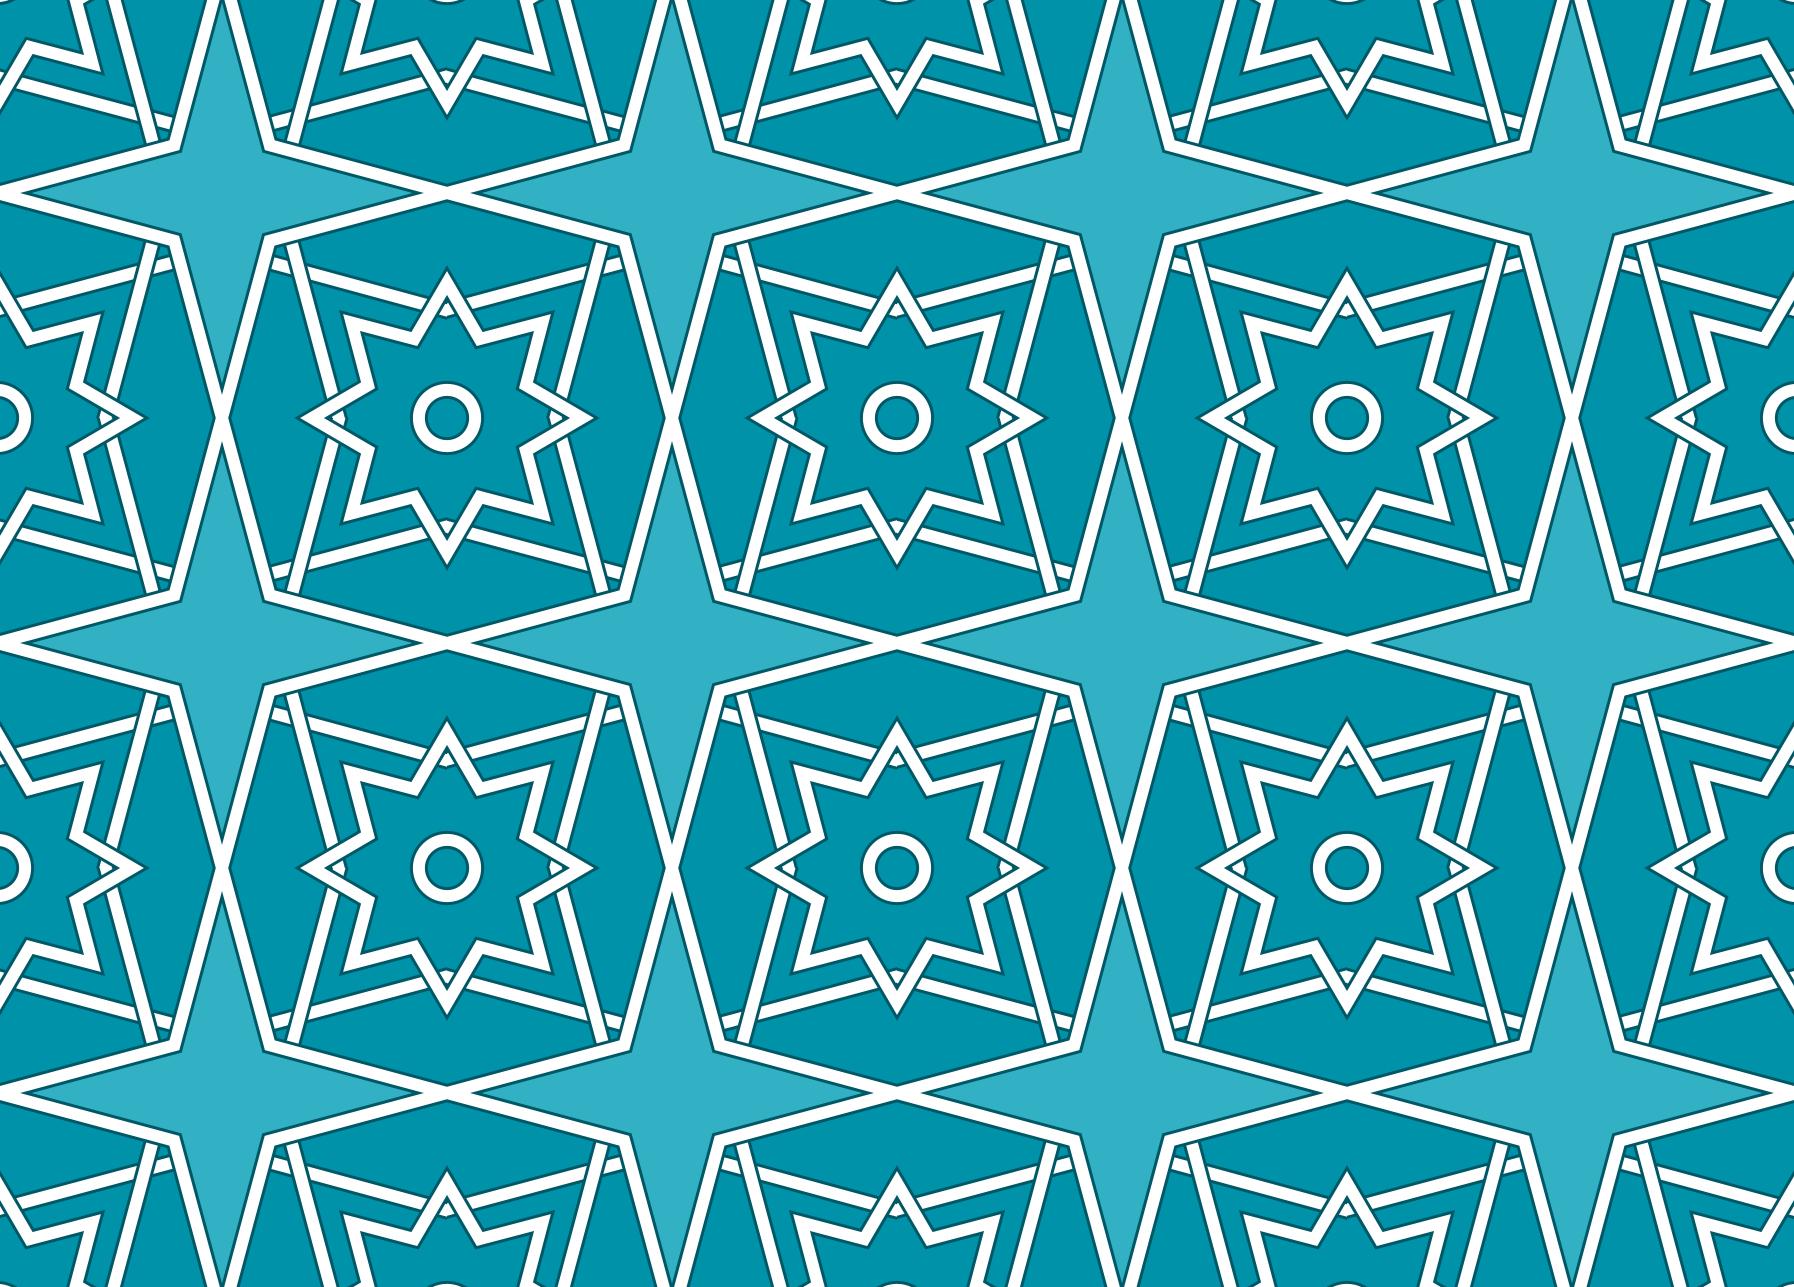 Monochrome tessellation—Islamic tile design